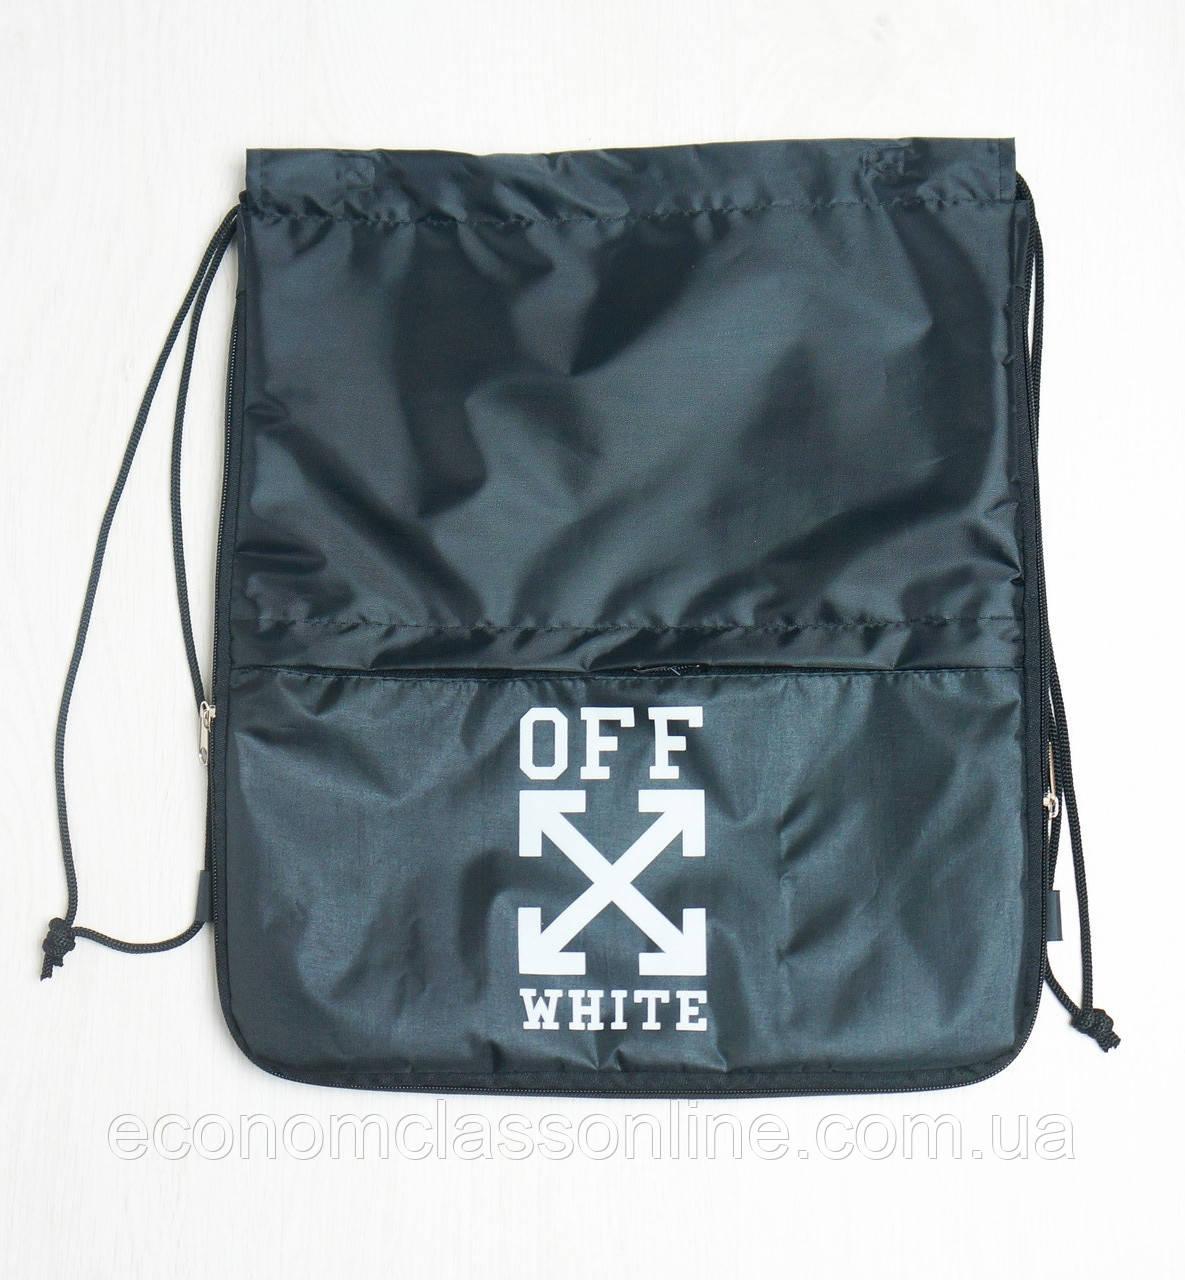 Рюкзак-Мішок для спорту Off White